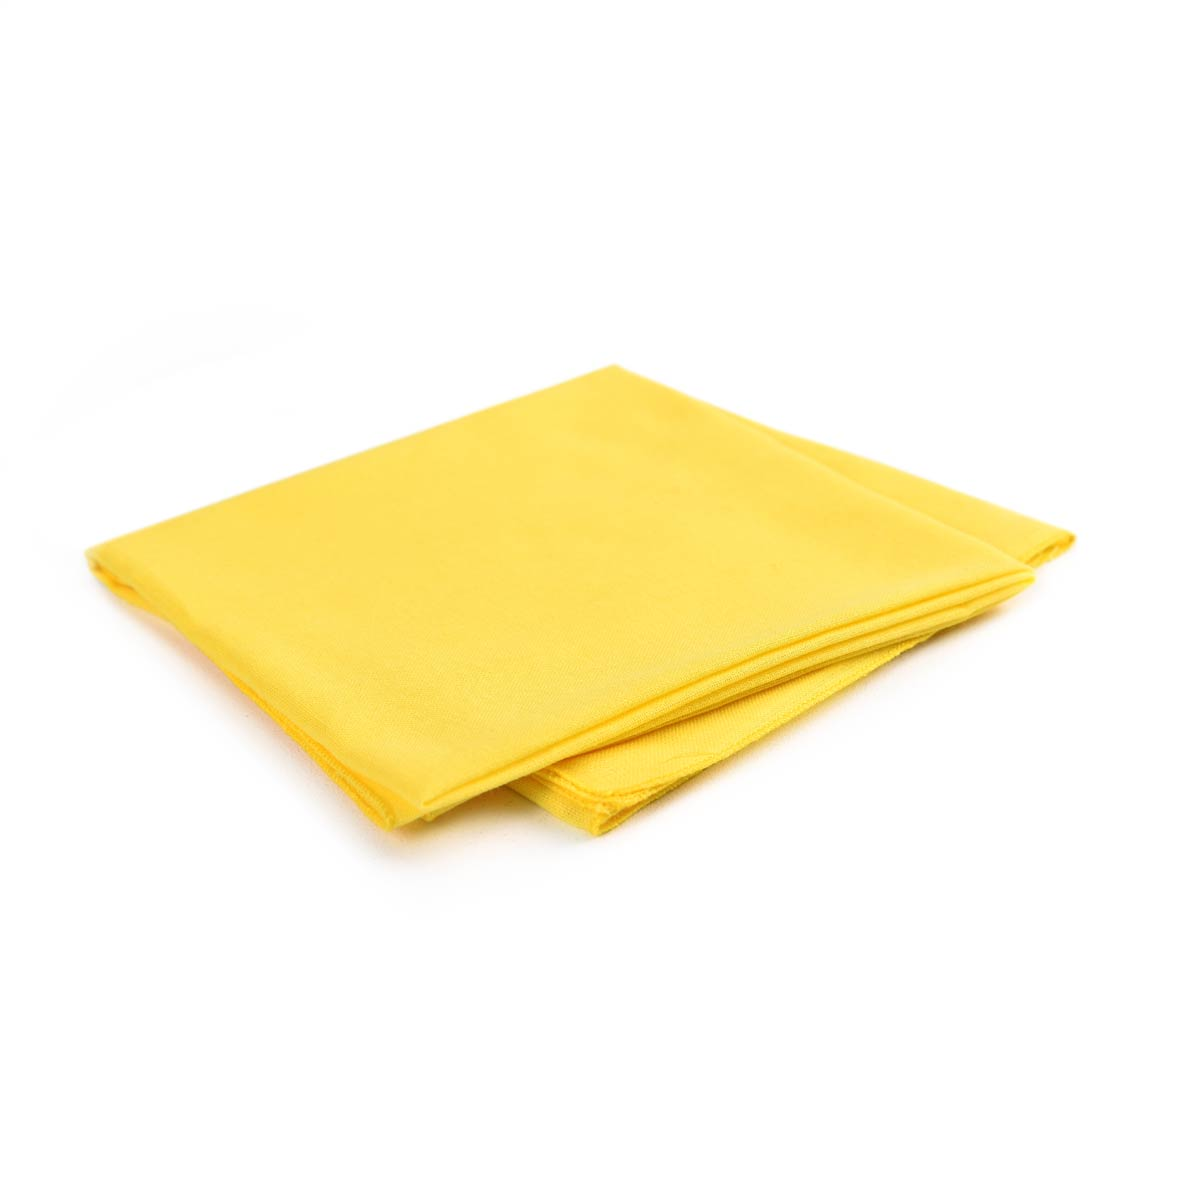 AT-04913_F12-2--_Bandana-jaune